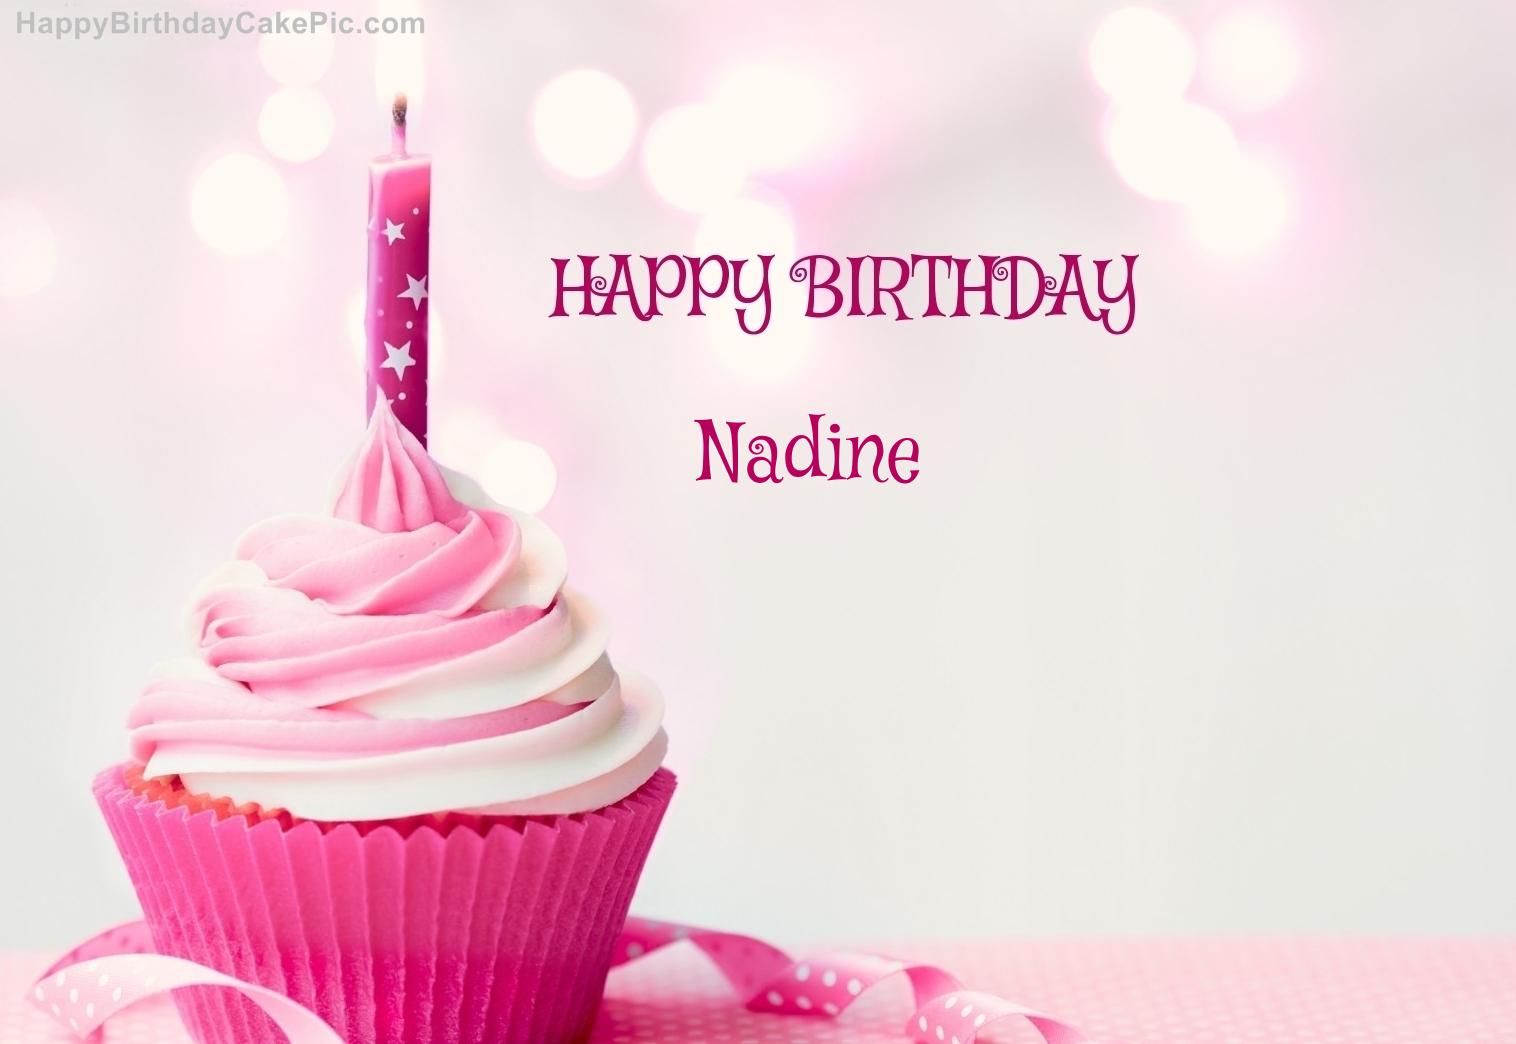 Happy Birthday Nadine Cake Images